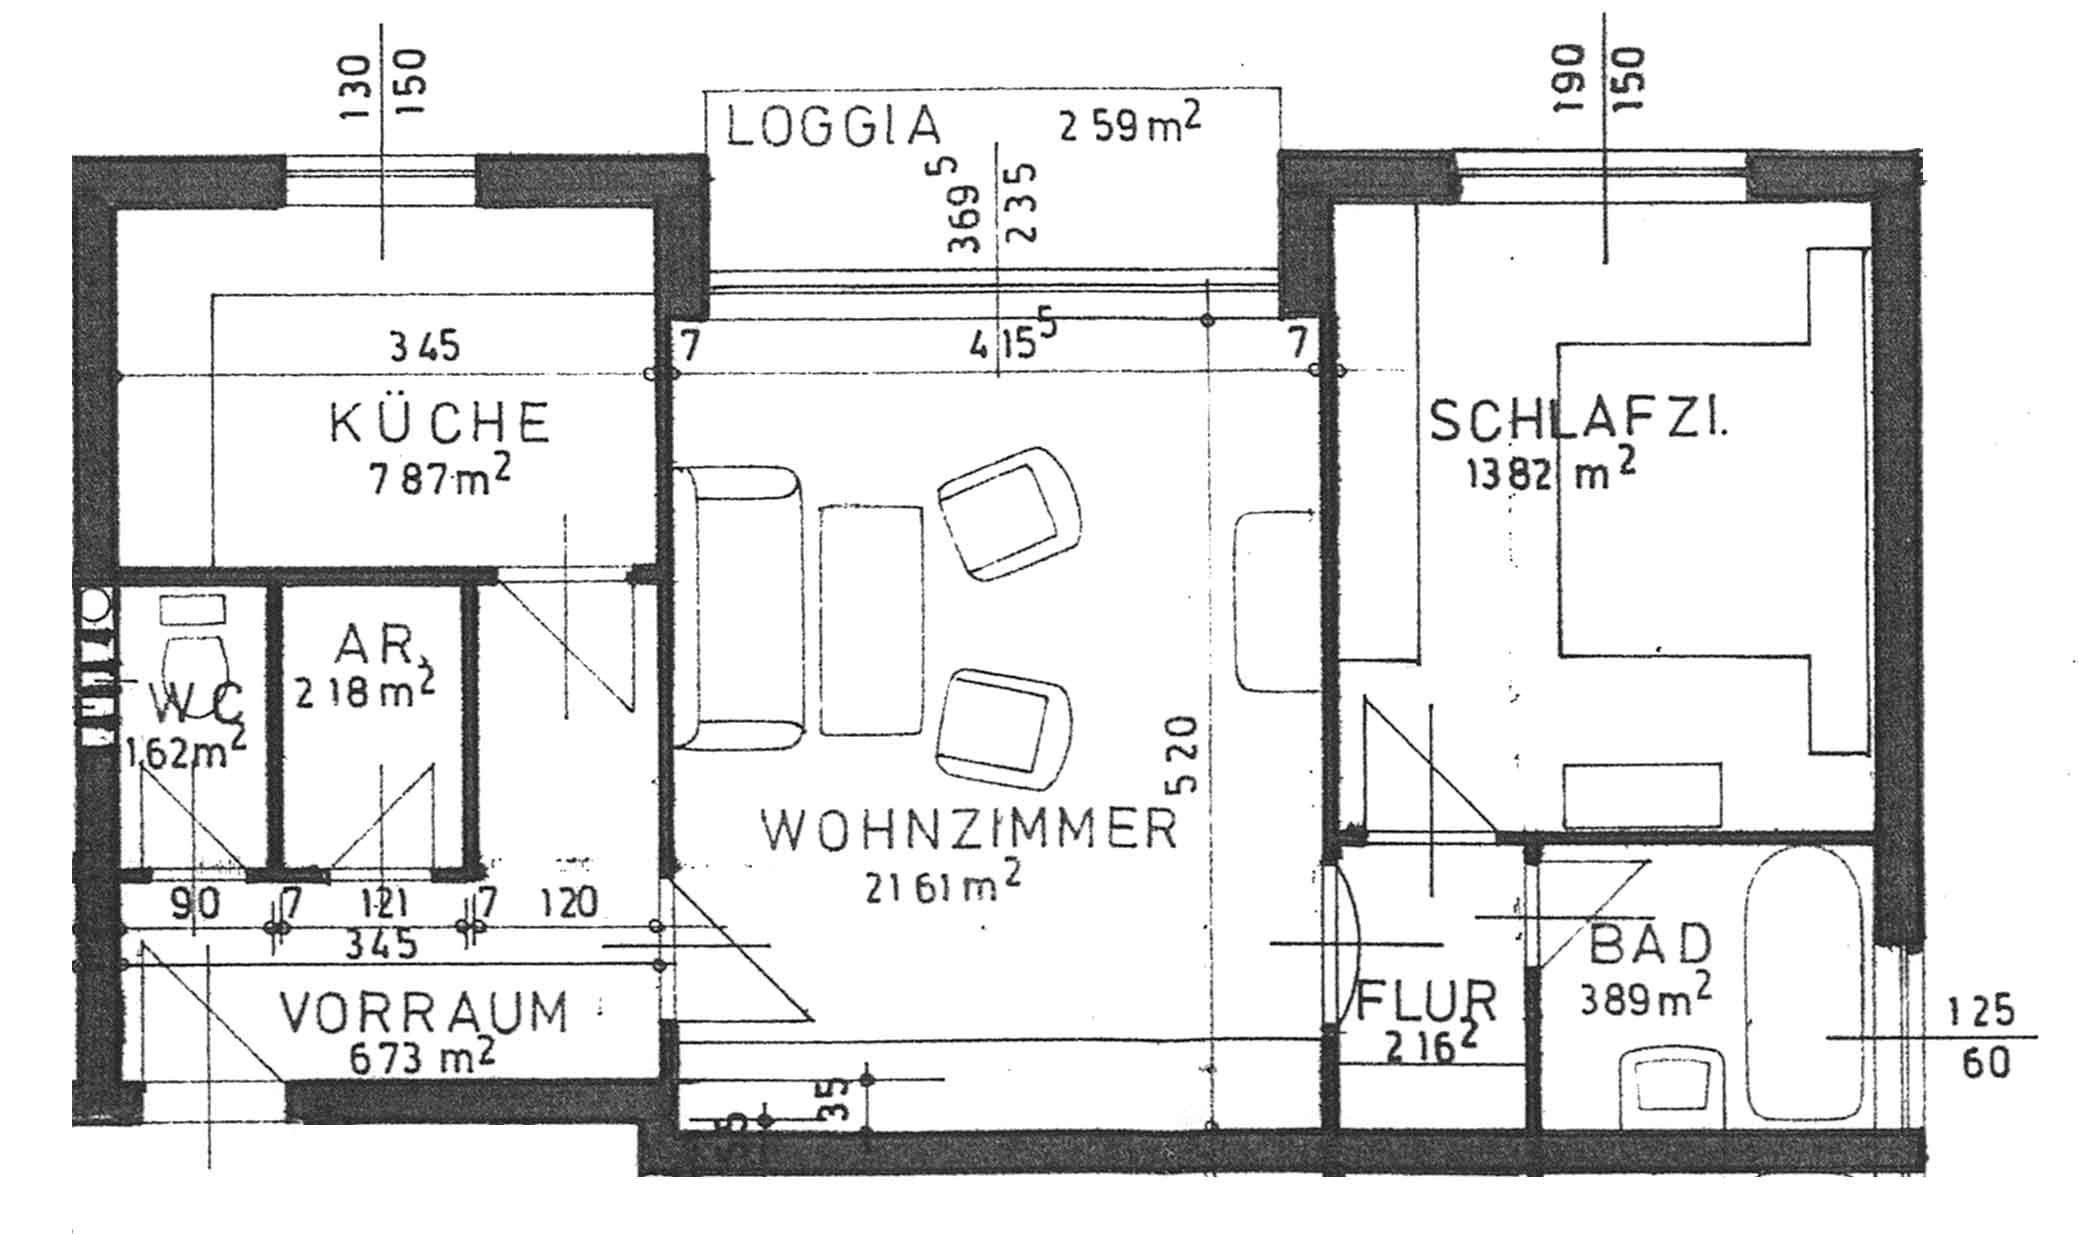 Immobilie von LAWOG in Hansbergstr.3/11, 4171 St. Peter am Wimberg #1